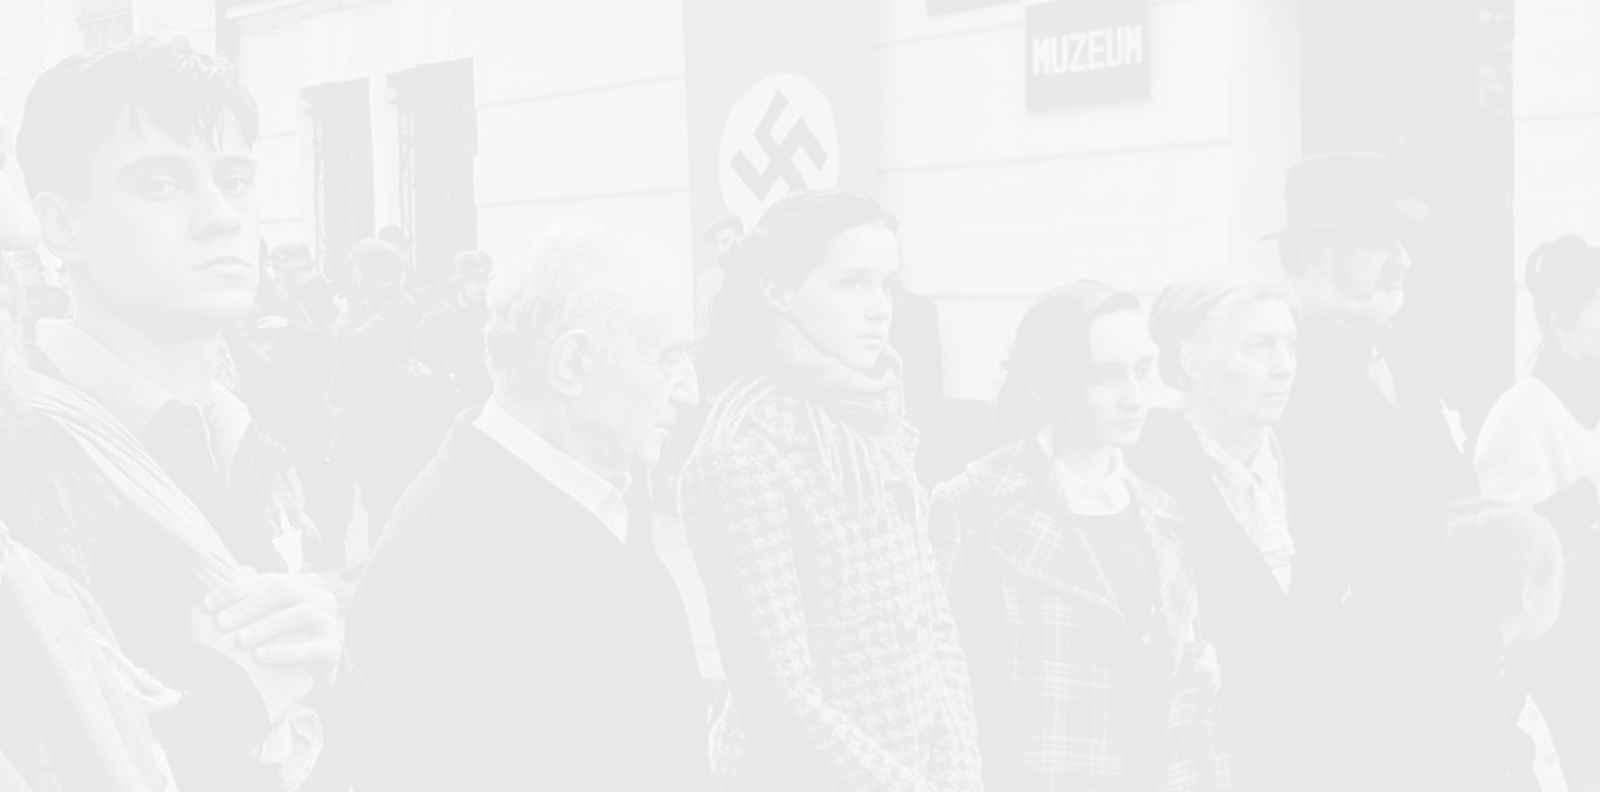 Профил на момиче, загинало през Холокоста, се появи в Instagram